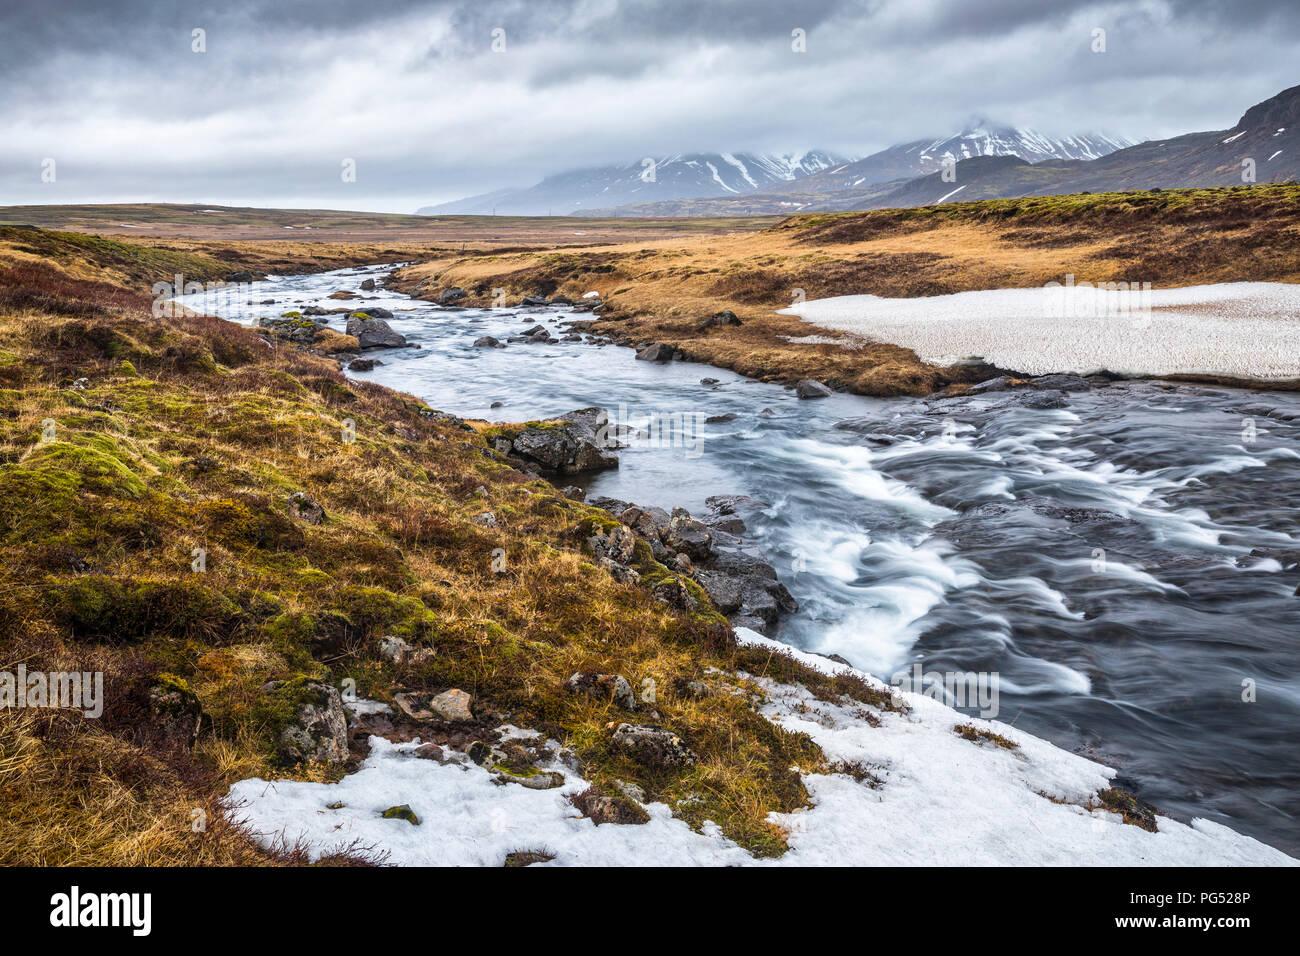 River landscape in Icelan, Pingvallavegur - Stock Image